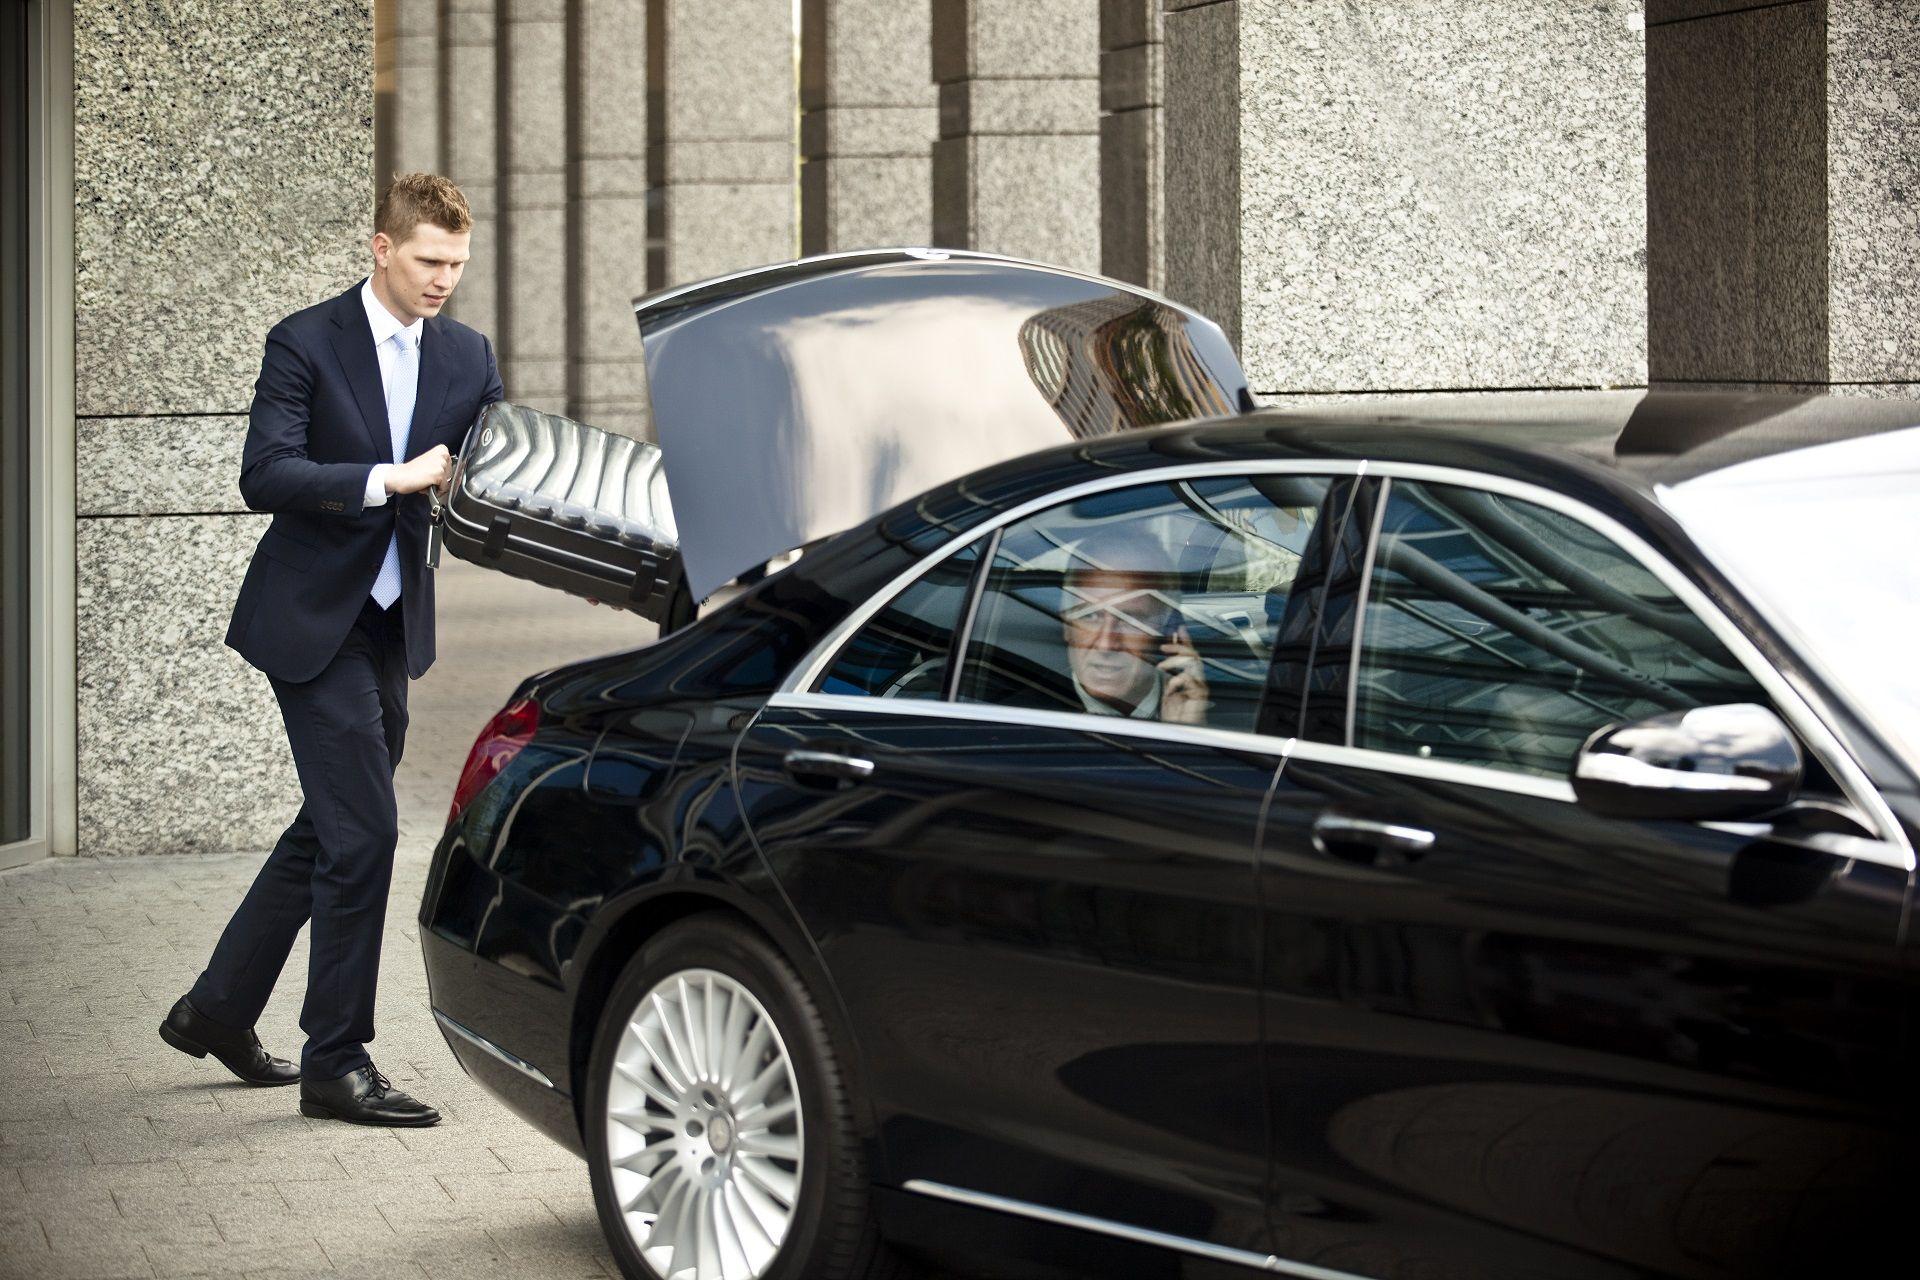 Hire Professional Chauffeur | Chauffeur, Chauffeur service, Airport  transfers